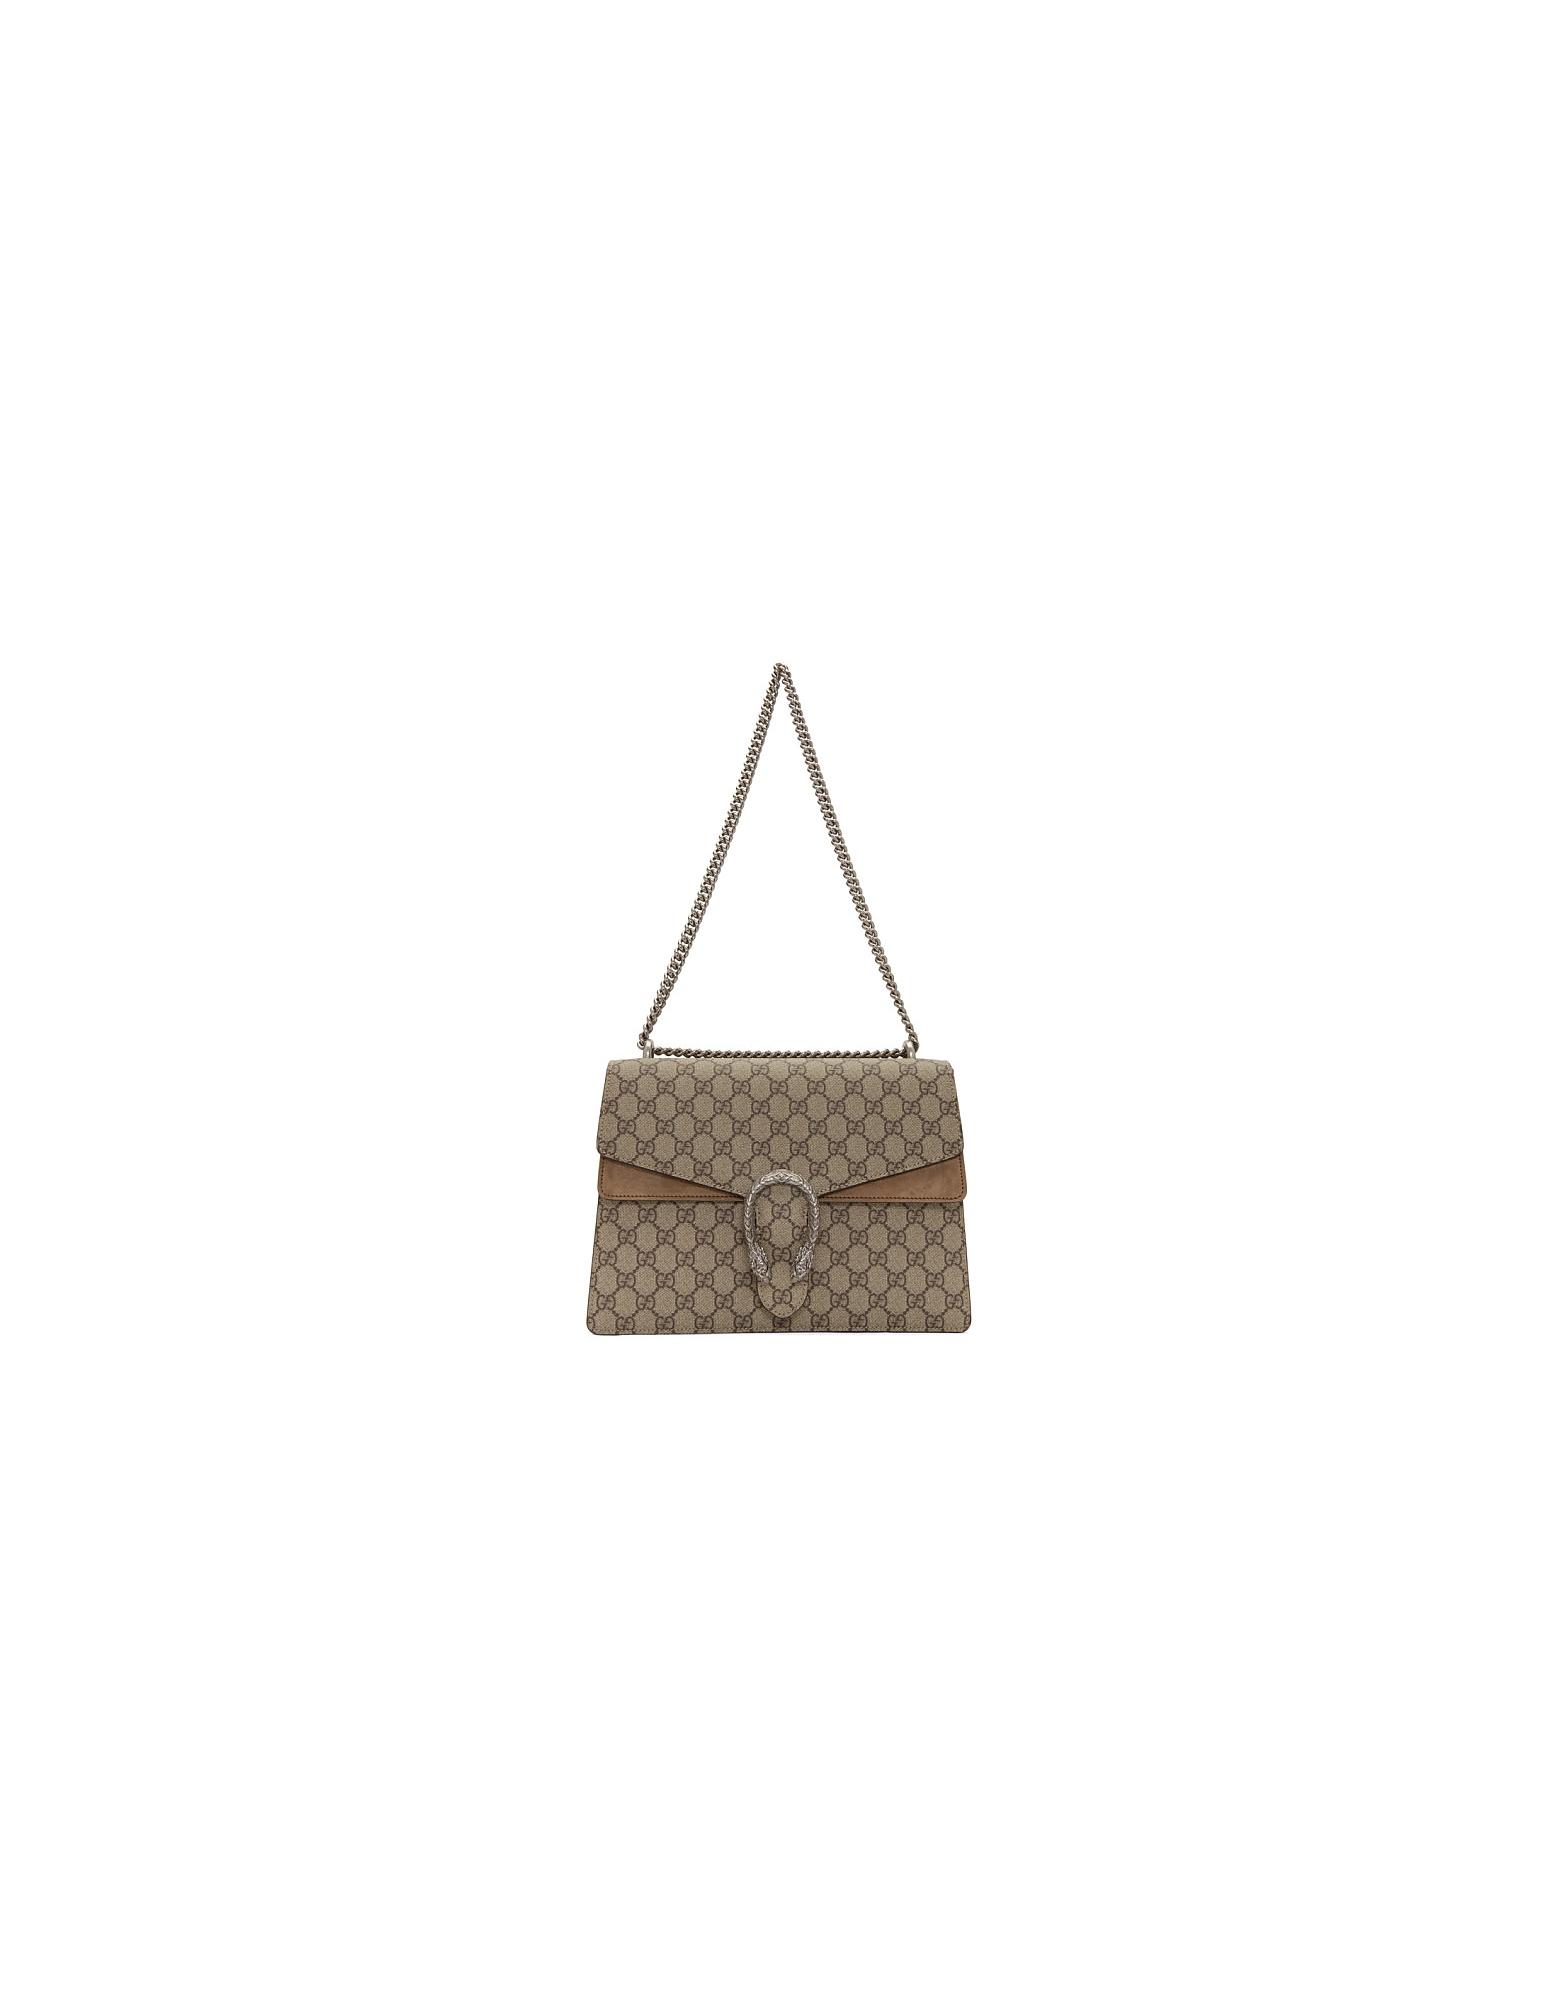 Gucci Designer Handbags, Beige Medium Dionysus Shoulder Bag